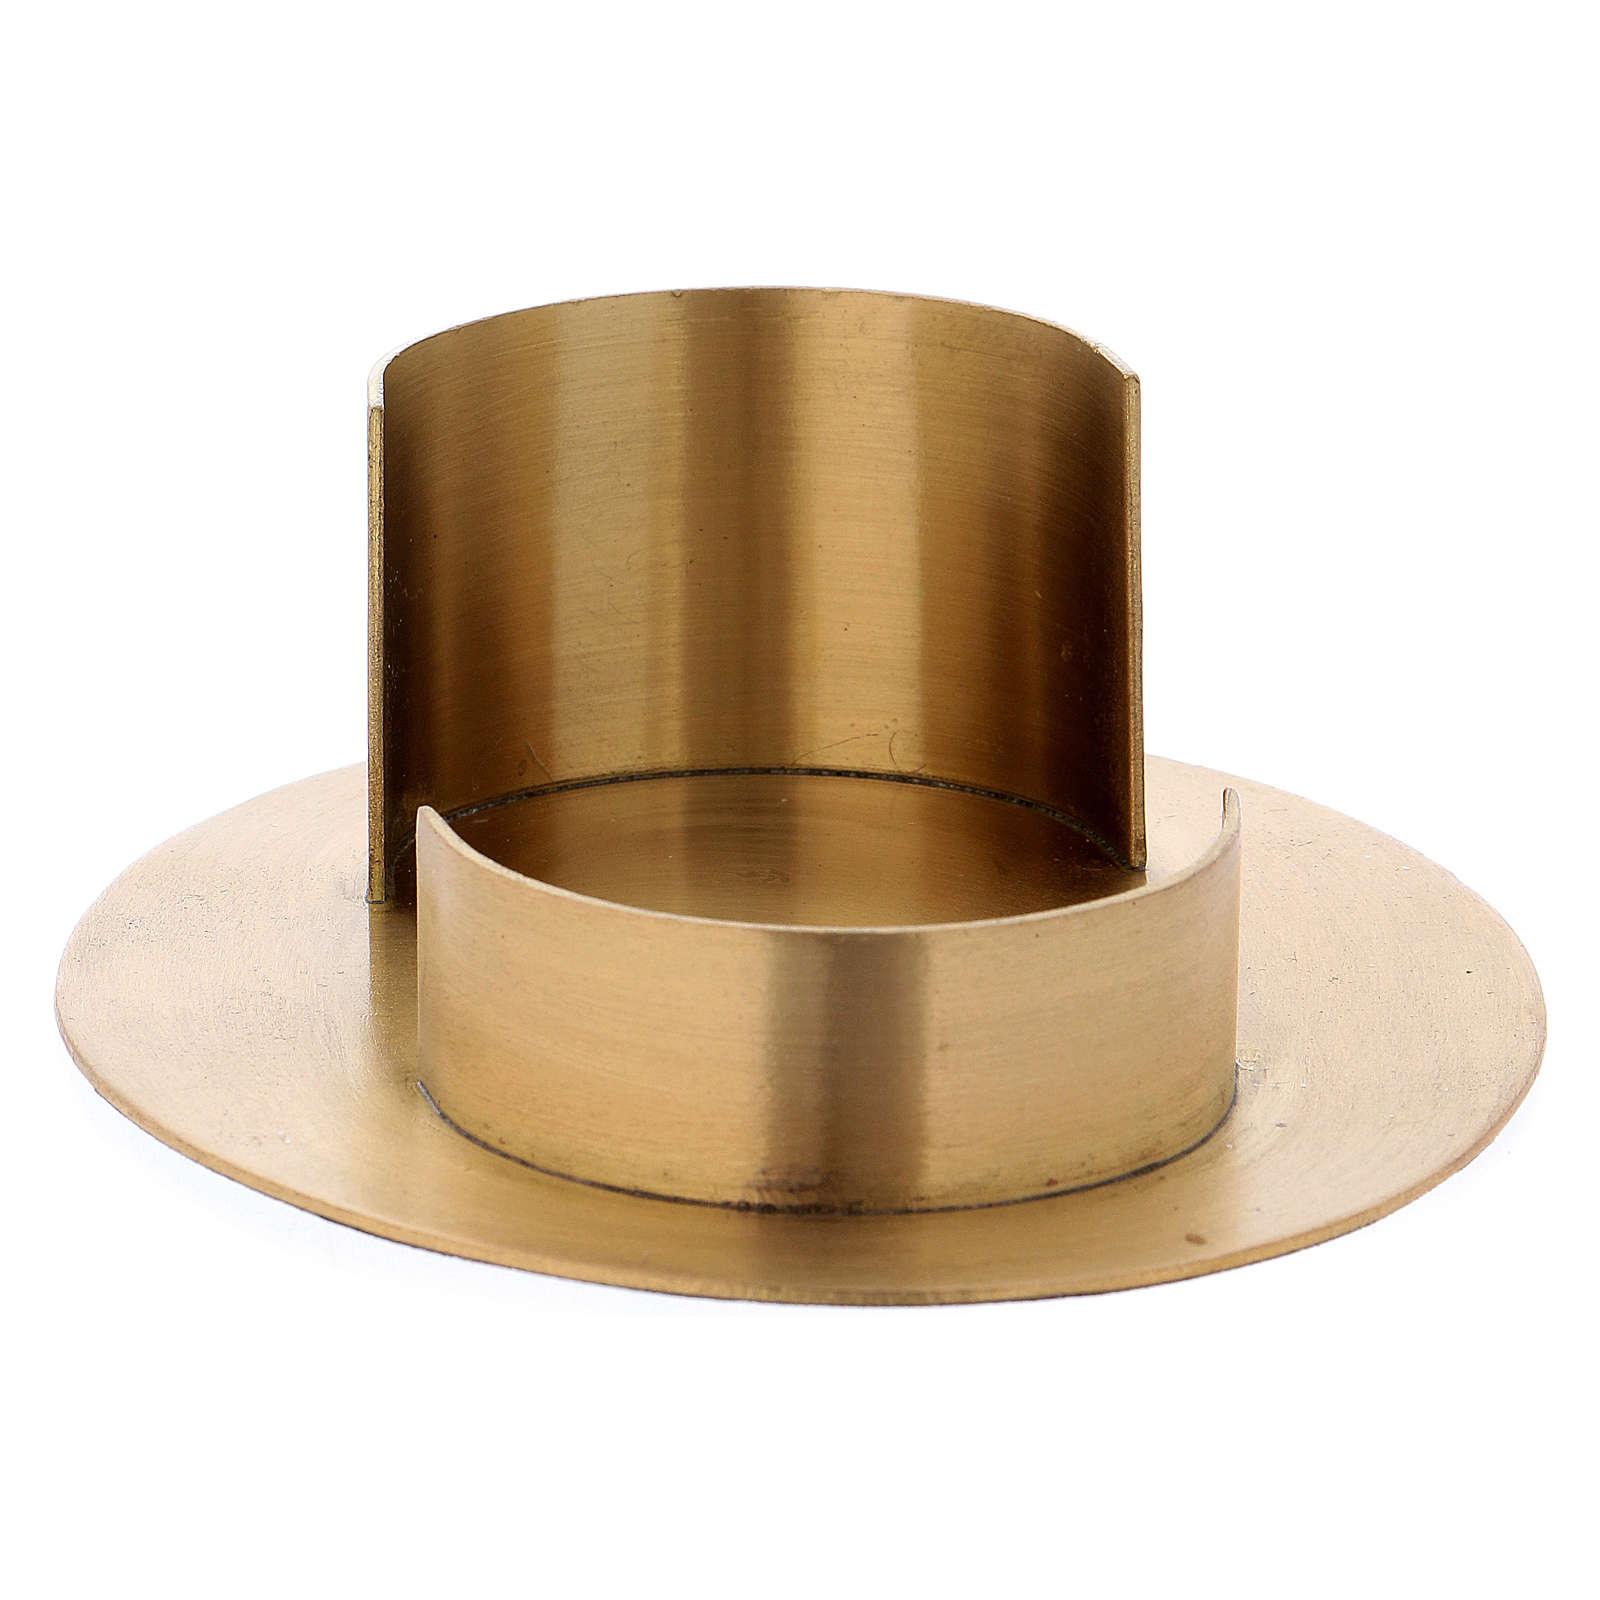 Portacandele forma ovale moderna in ottone dorato satinato interno 9x 5 cm 4